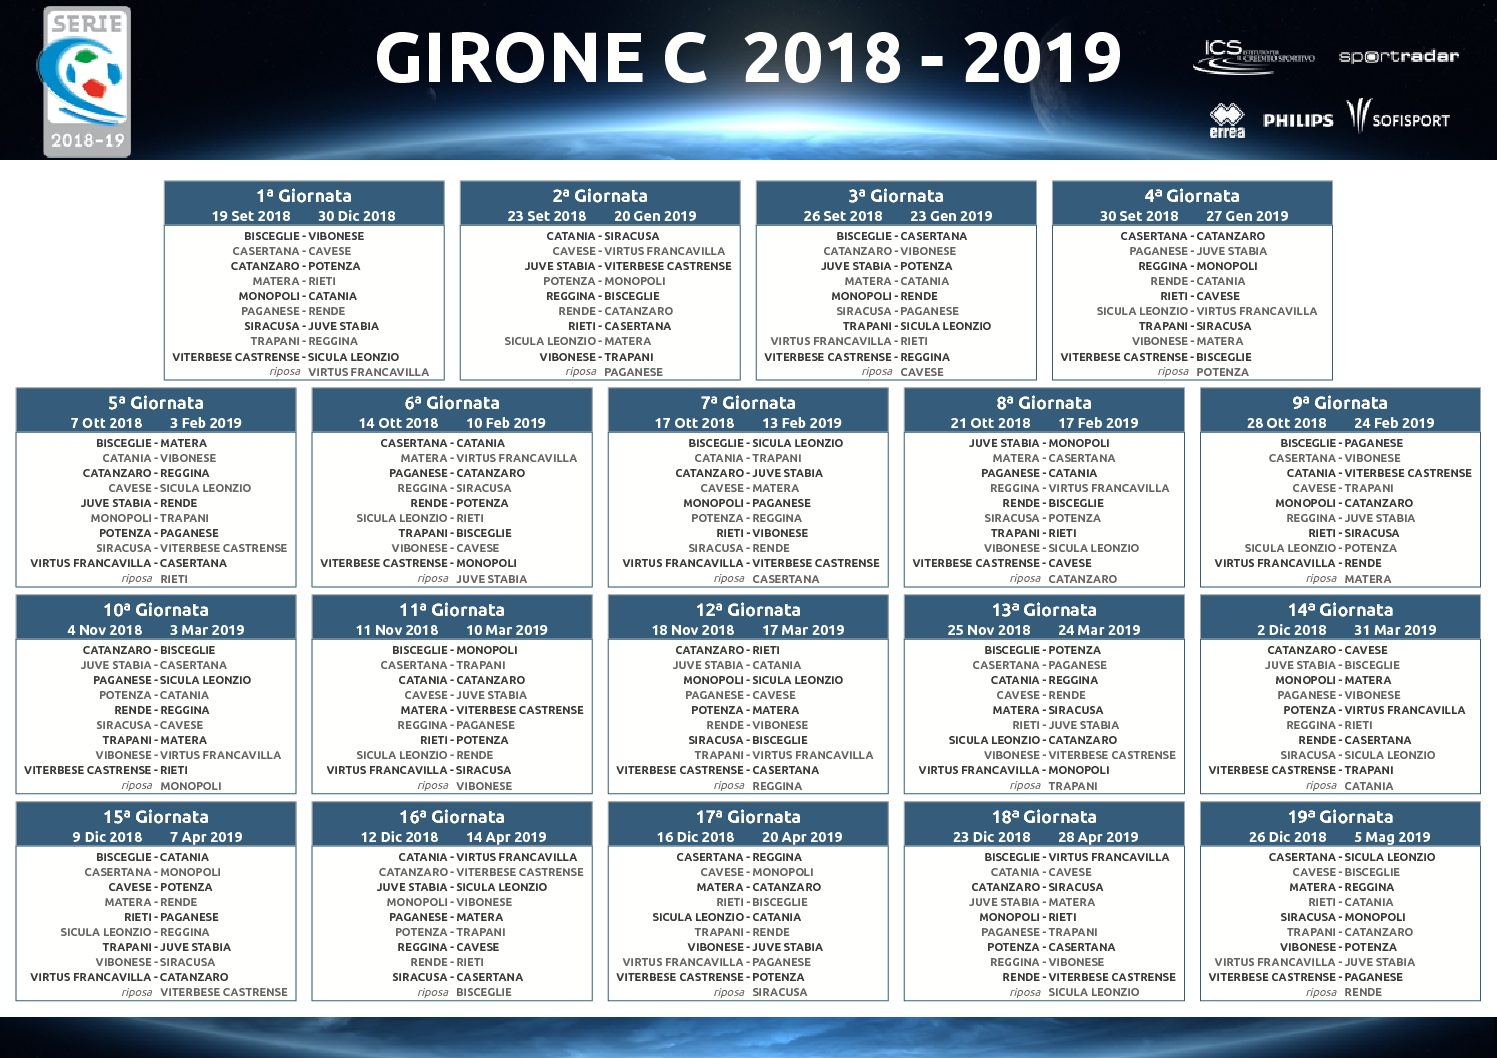 Calendario Lega Pro Girone C 2020.Salvatore Condemi Reggina Unico Amore